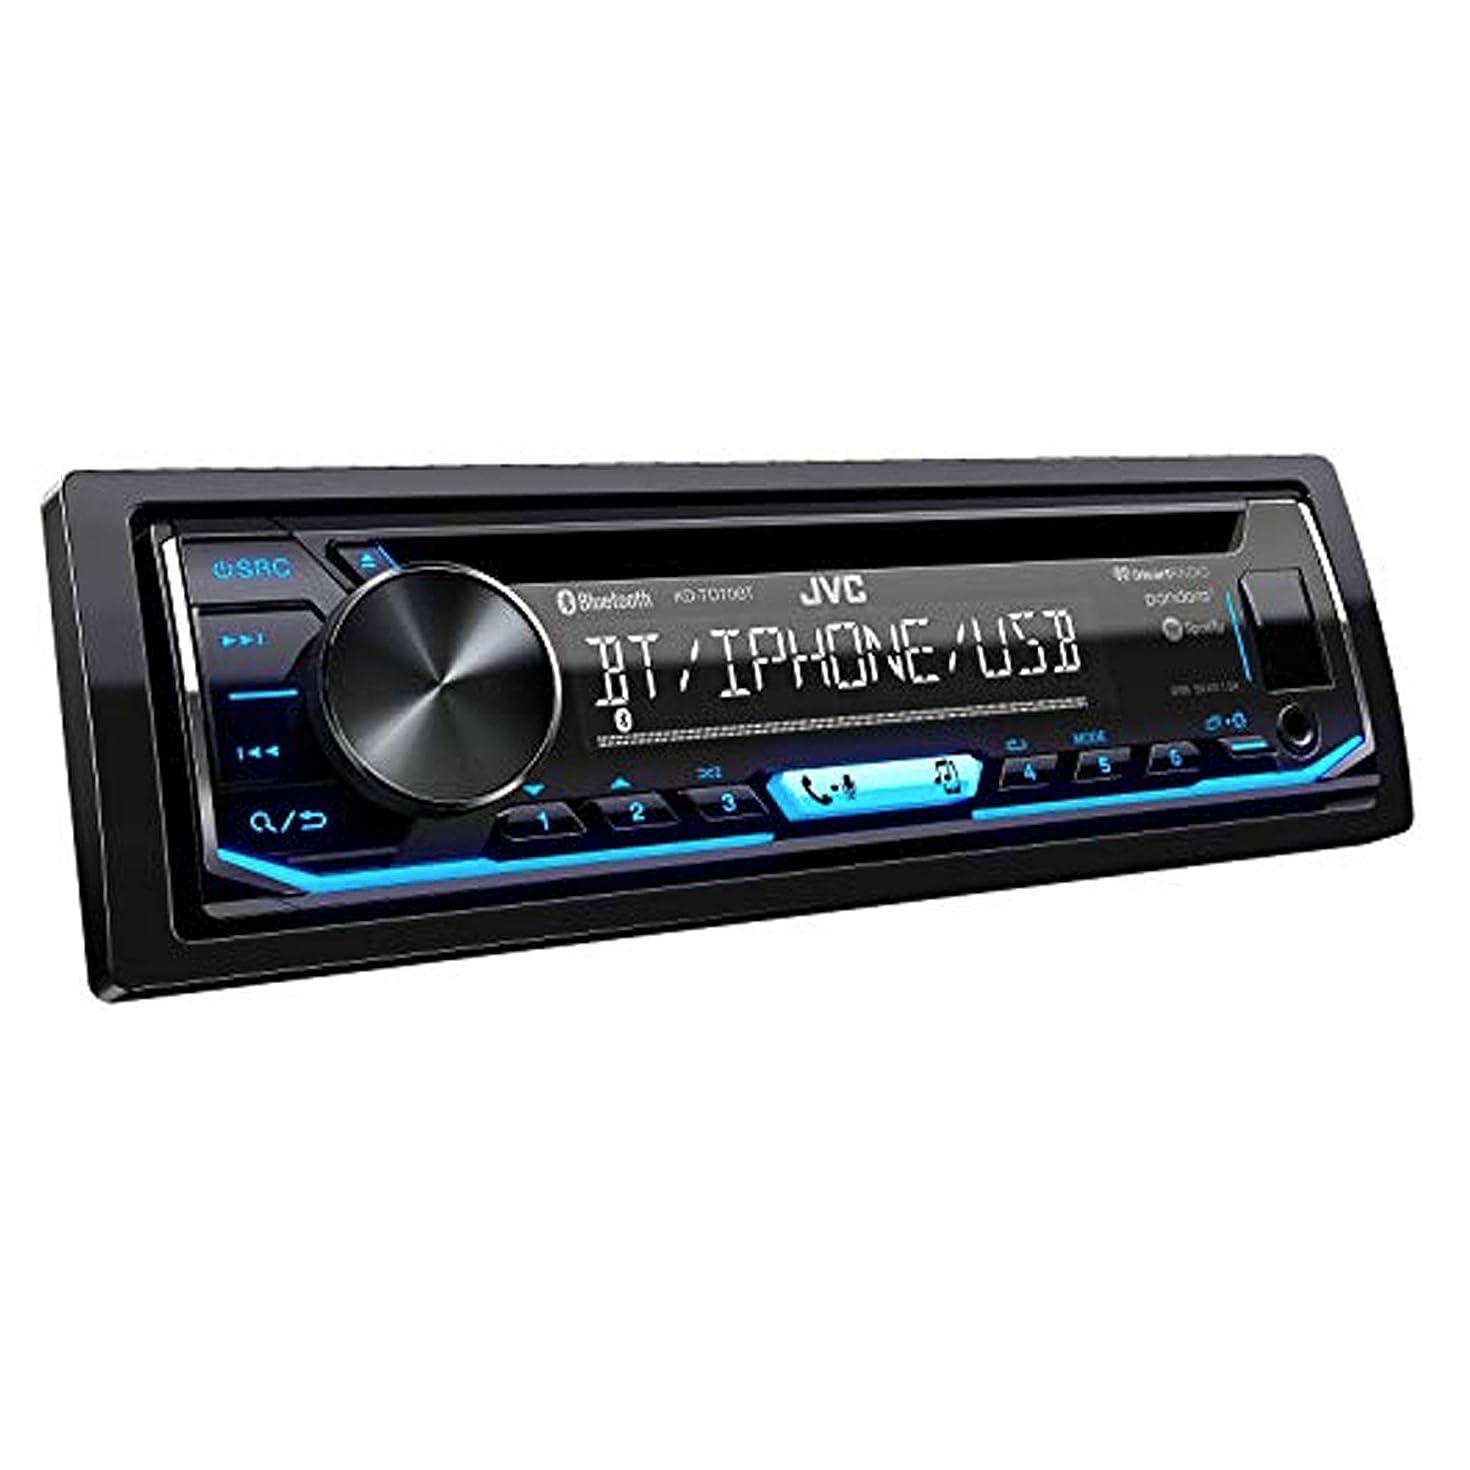 JVC KD-TD70BT CD Receiver Featuring Bluetooth/USB/Pandora/iHeartRadio/Spotify/FLAC / 13-Band EQ